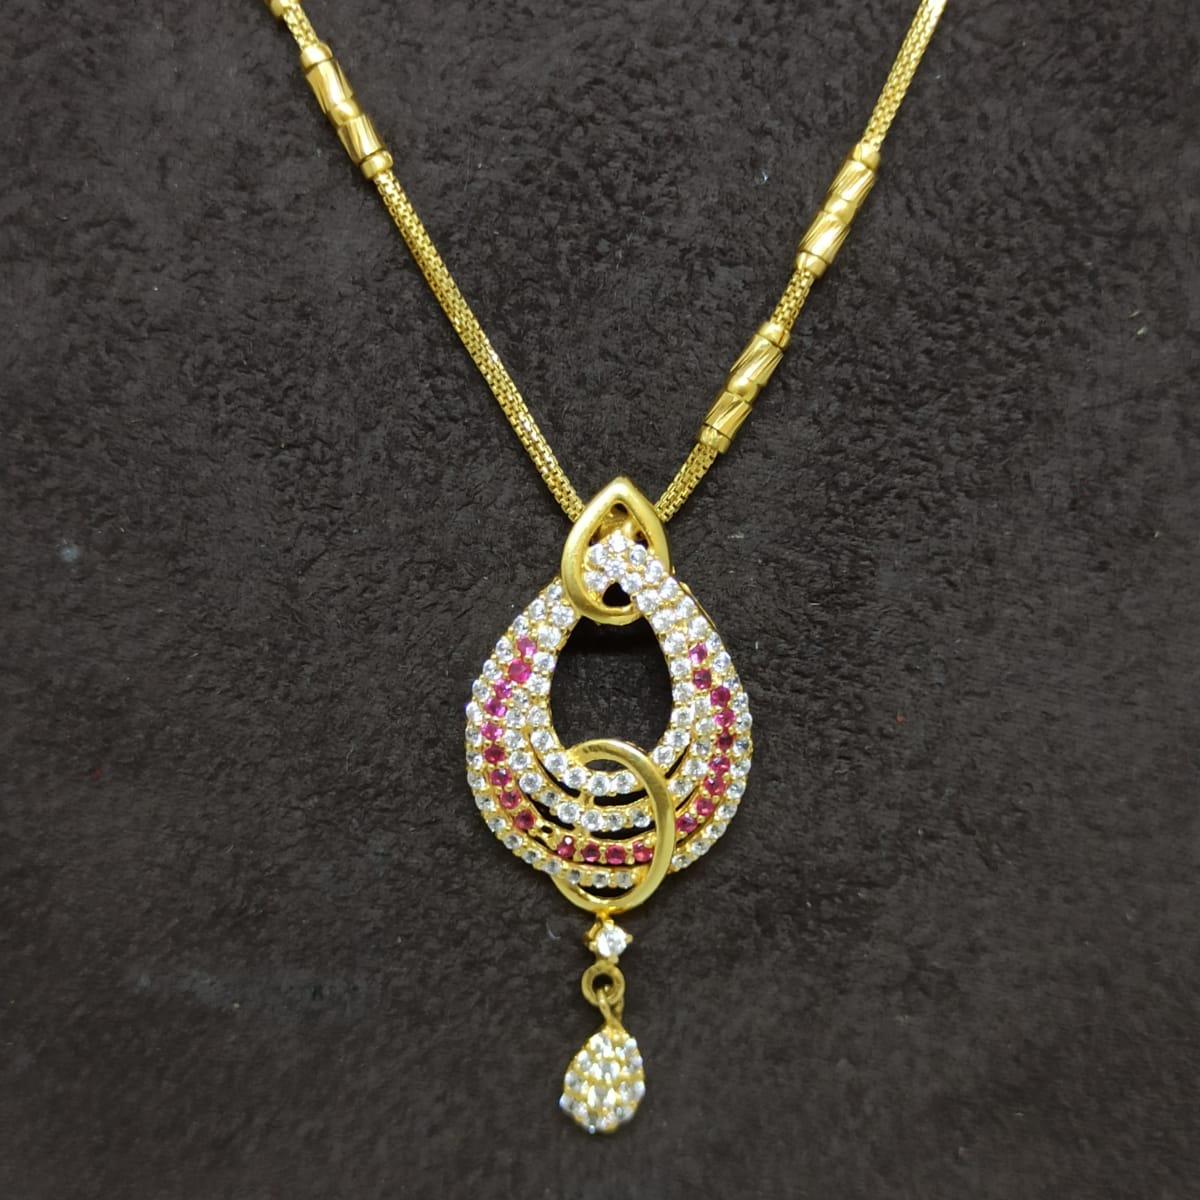 Colorstone Cz Chain Necklace